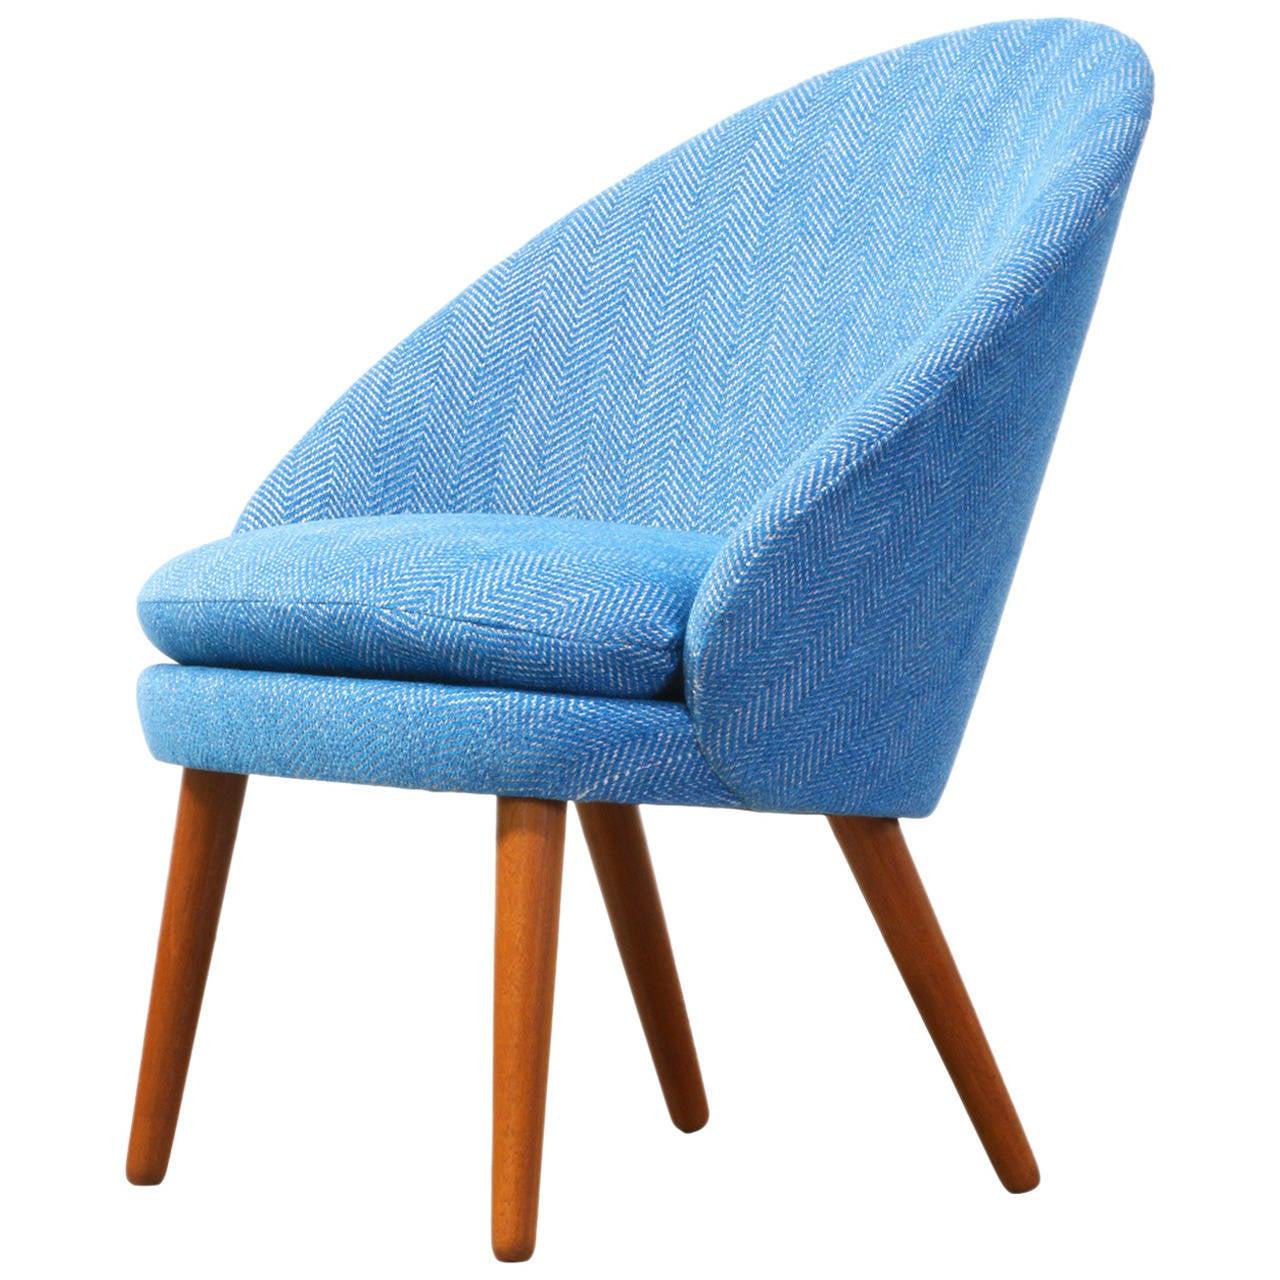 Rare E. Johansson #301 Tub Chair for Godfred H. Petersen at 1stdibs